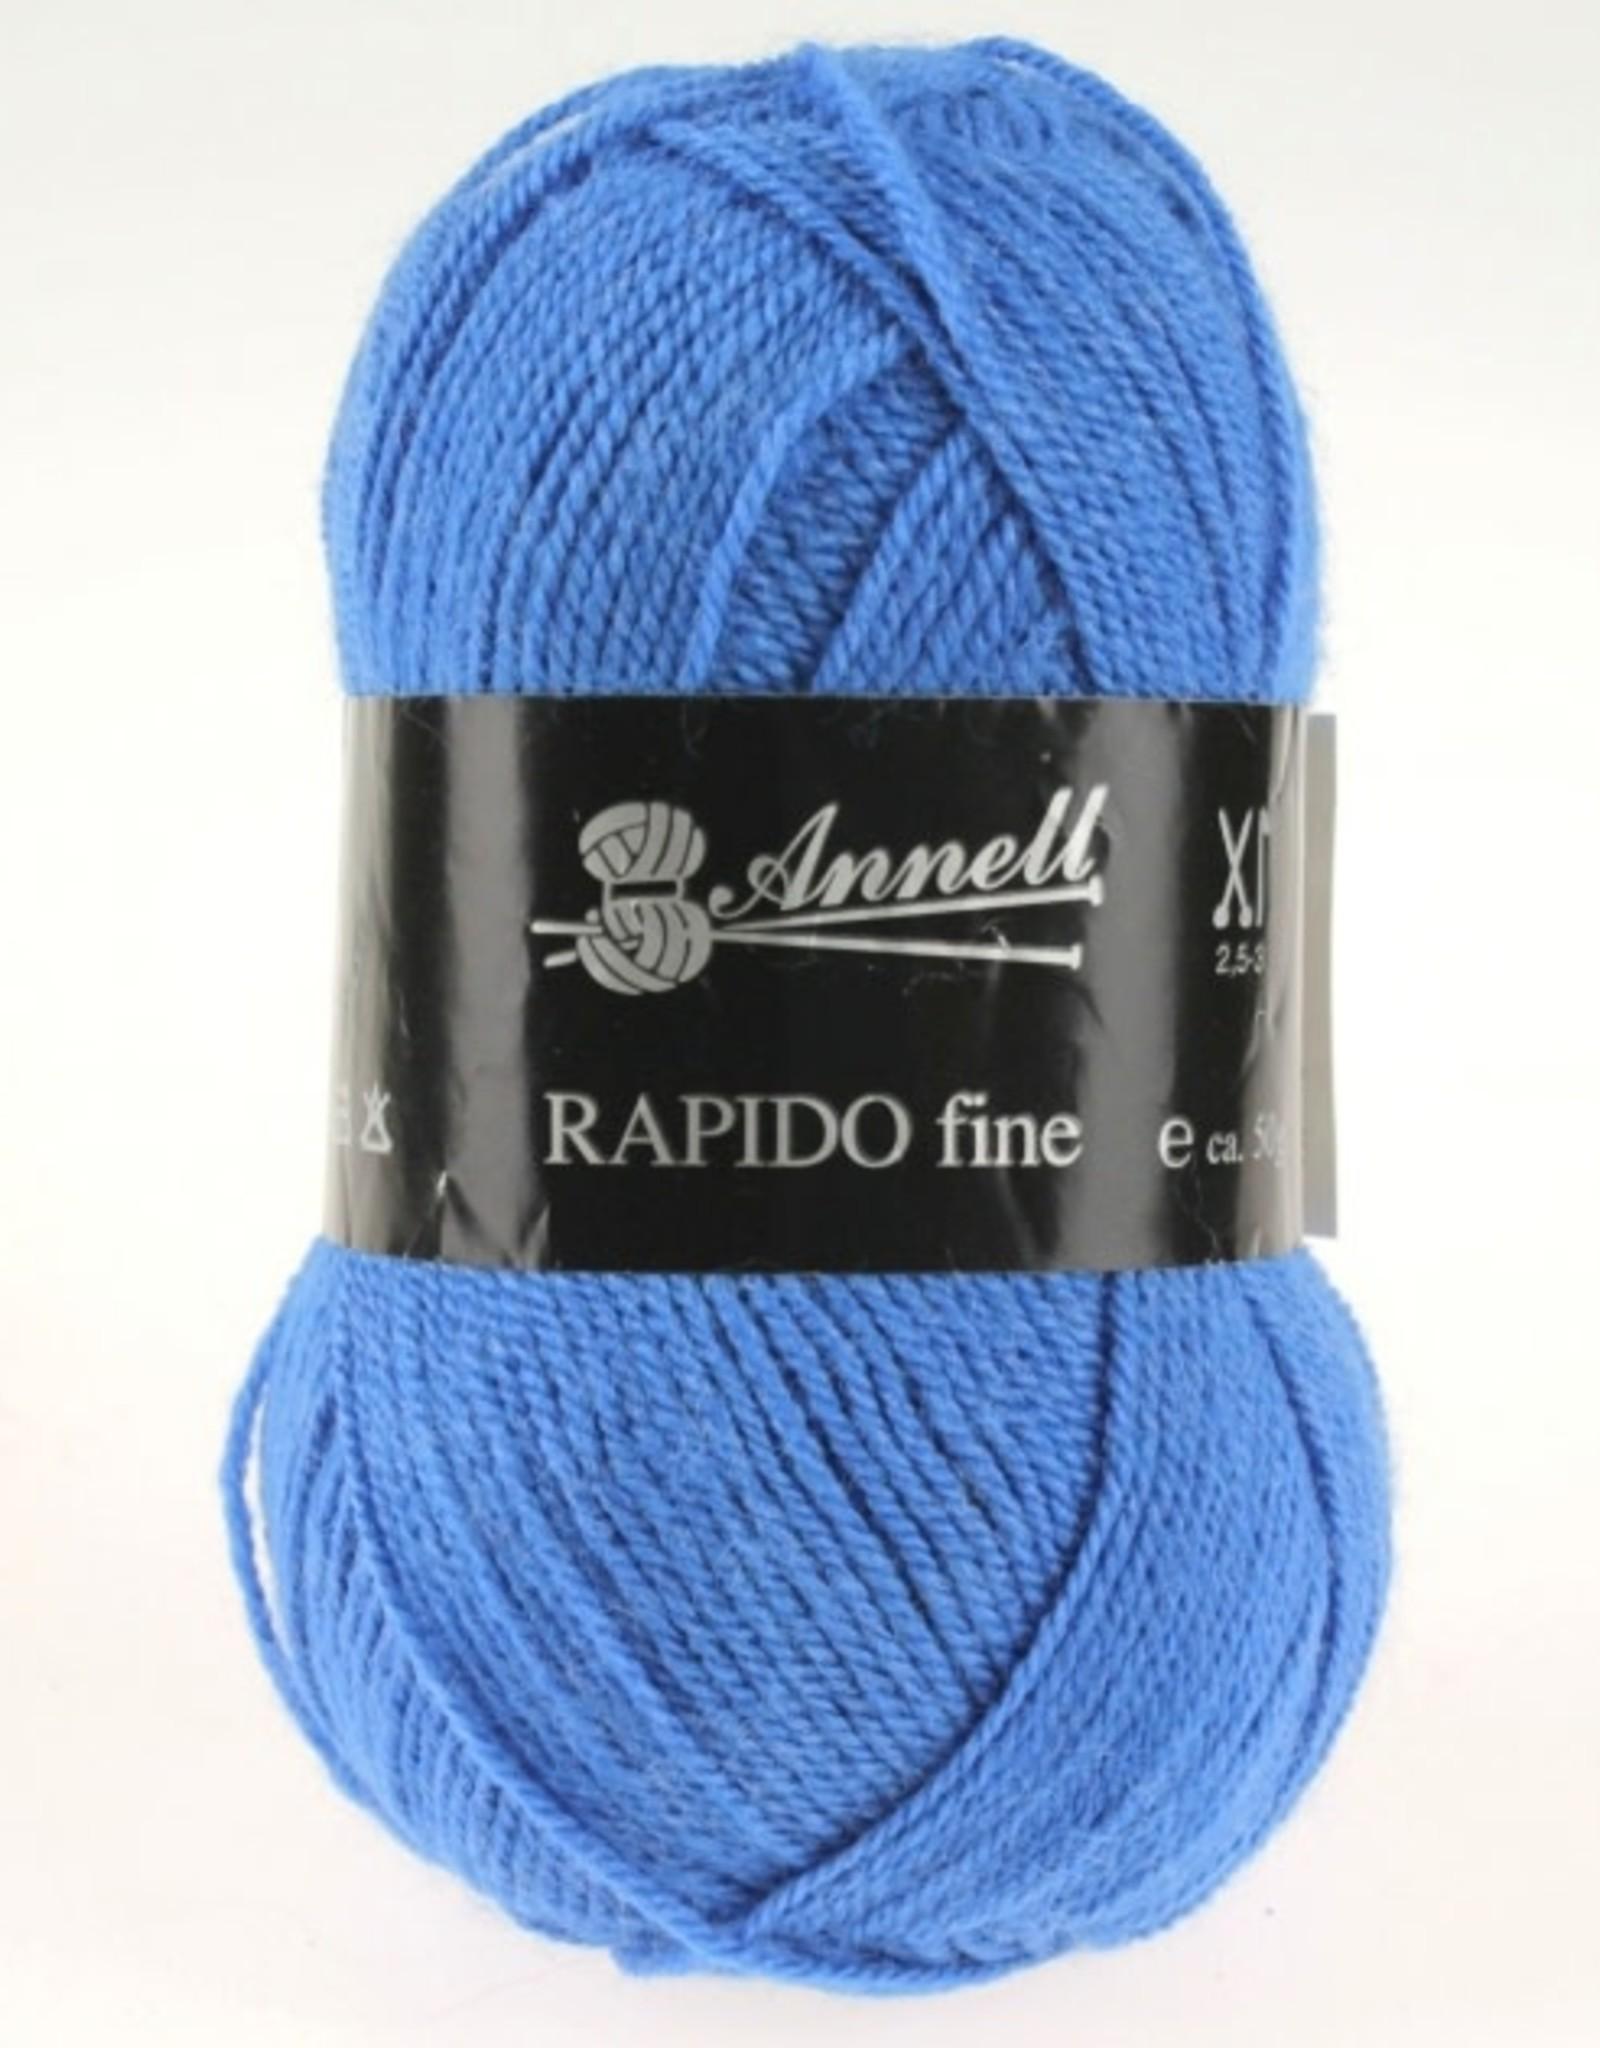 Annell Annell rapido fine 8240